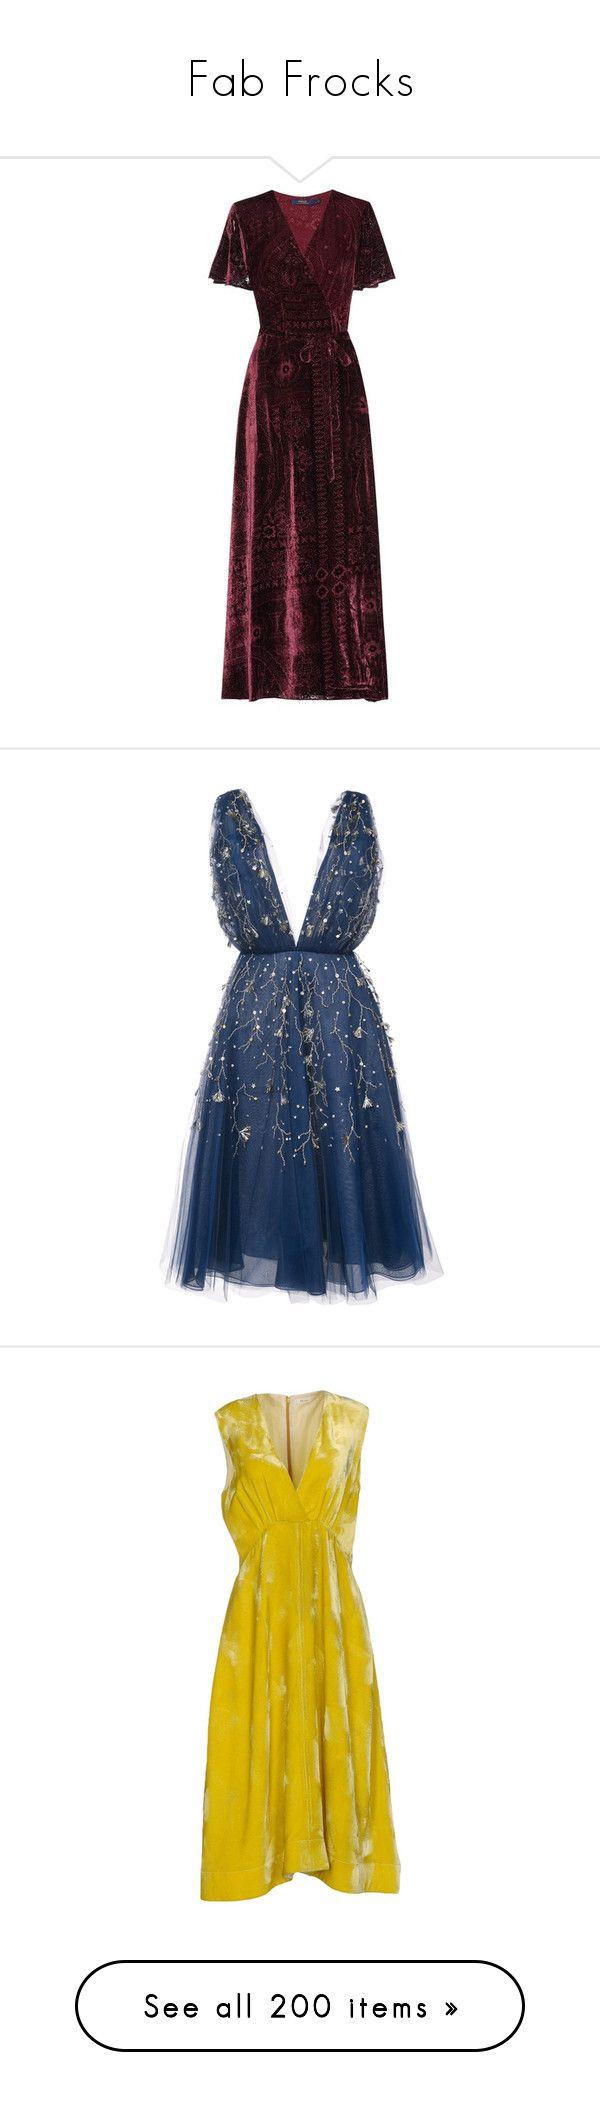 """Fab Frocks"" by halcyon-heart ❤ liked on Polyvore featuring dresses, purple, purple dress, polo ralph lauren dress, polo ralph lauren, short dresses, cocktail dresses, vestido, blue and blue mini dress"